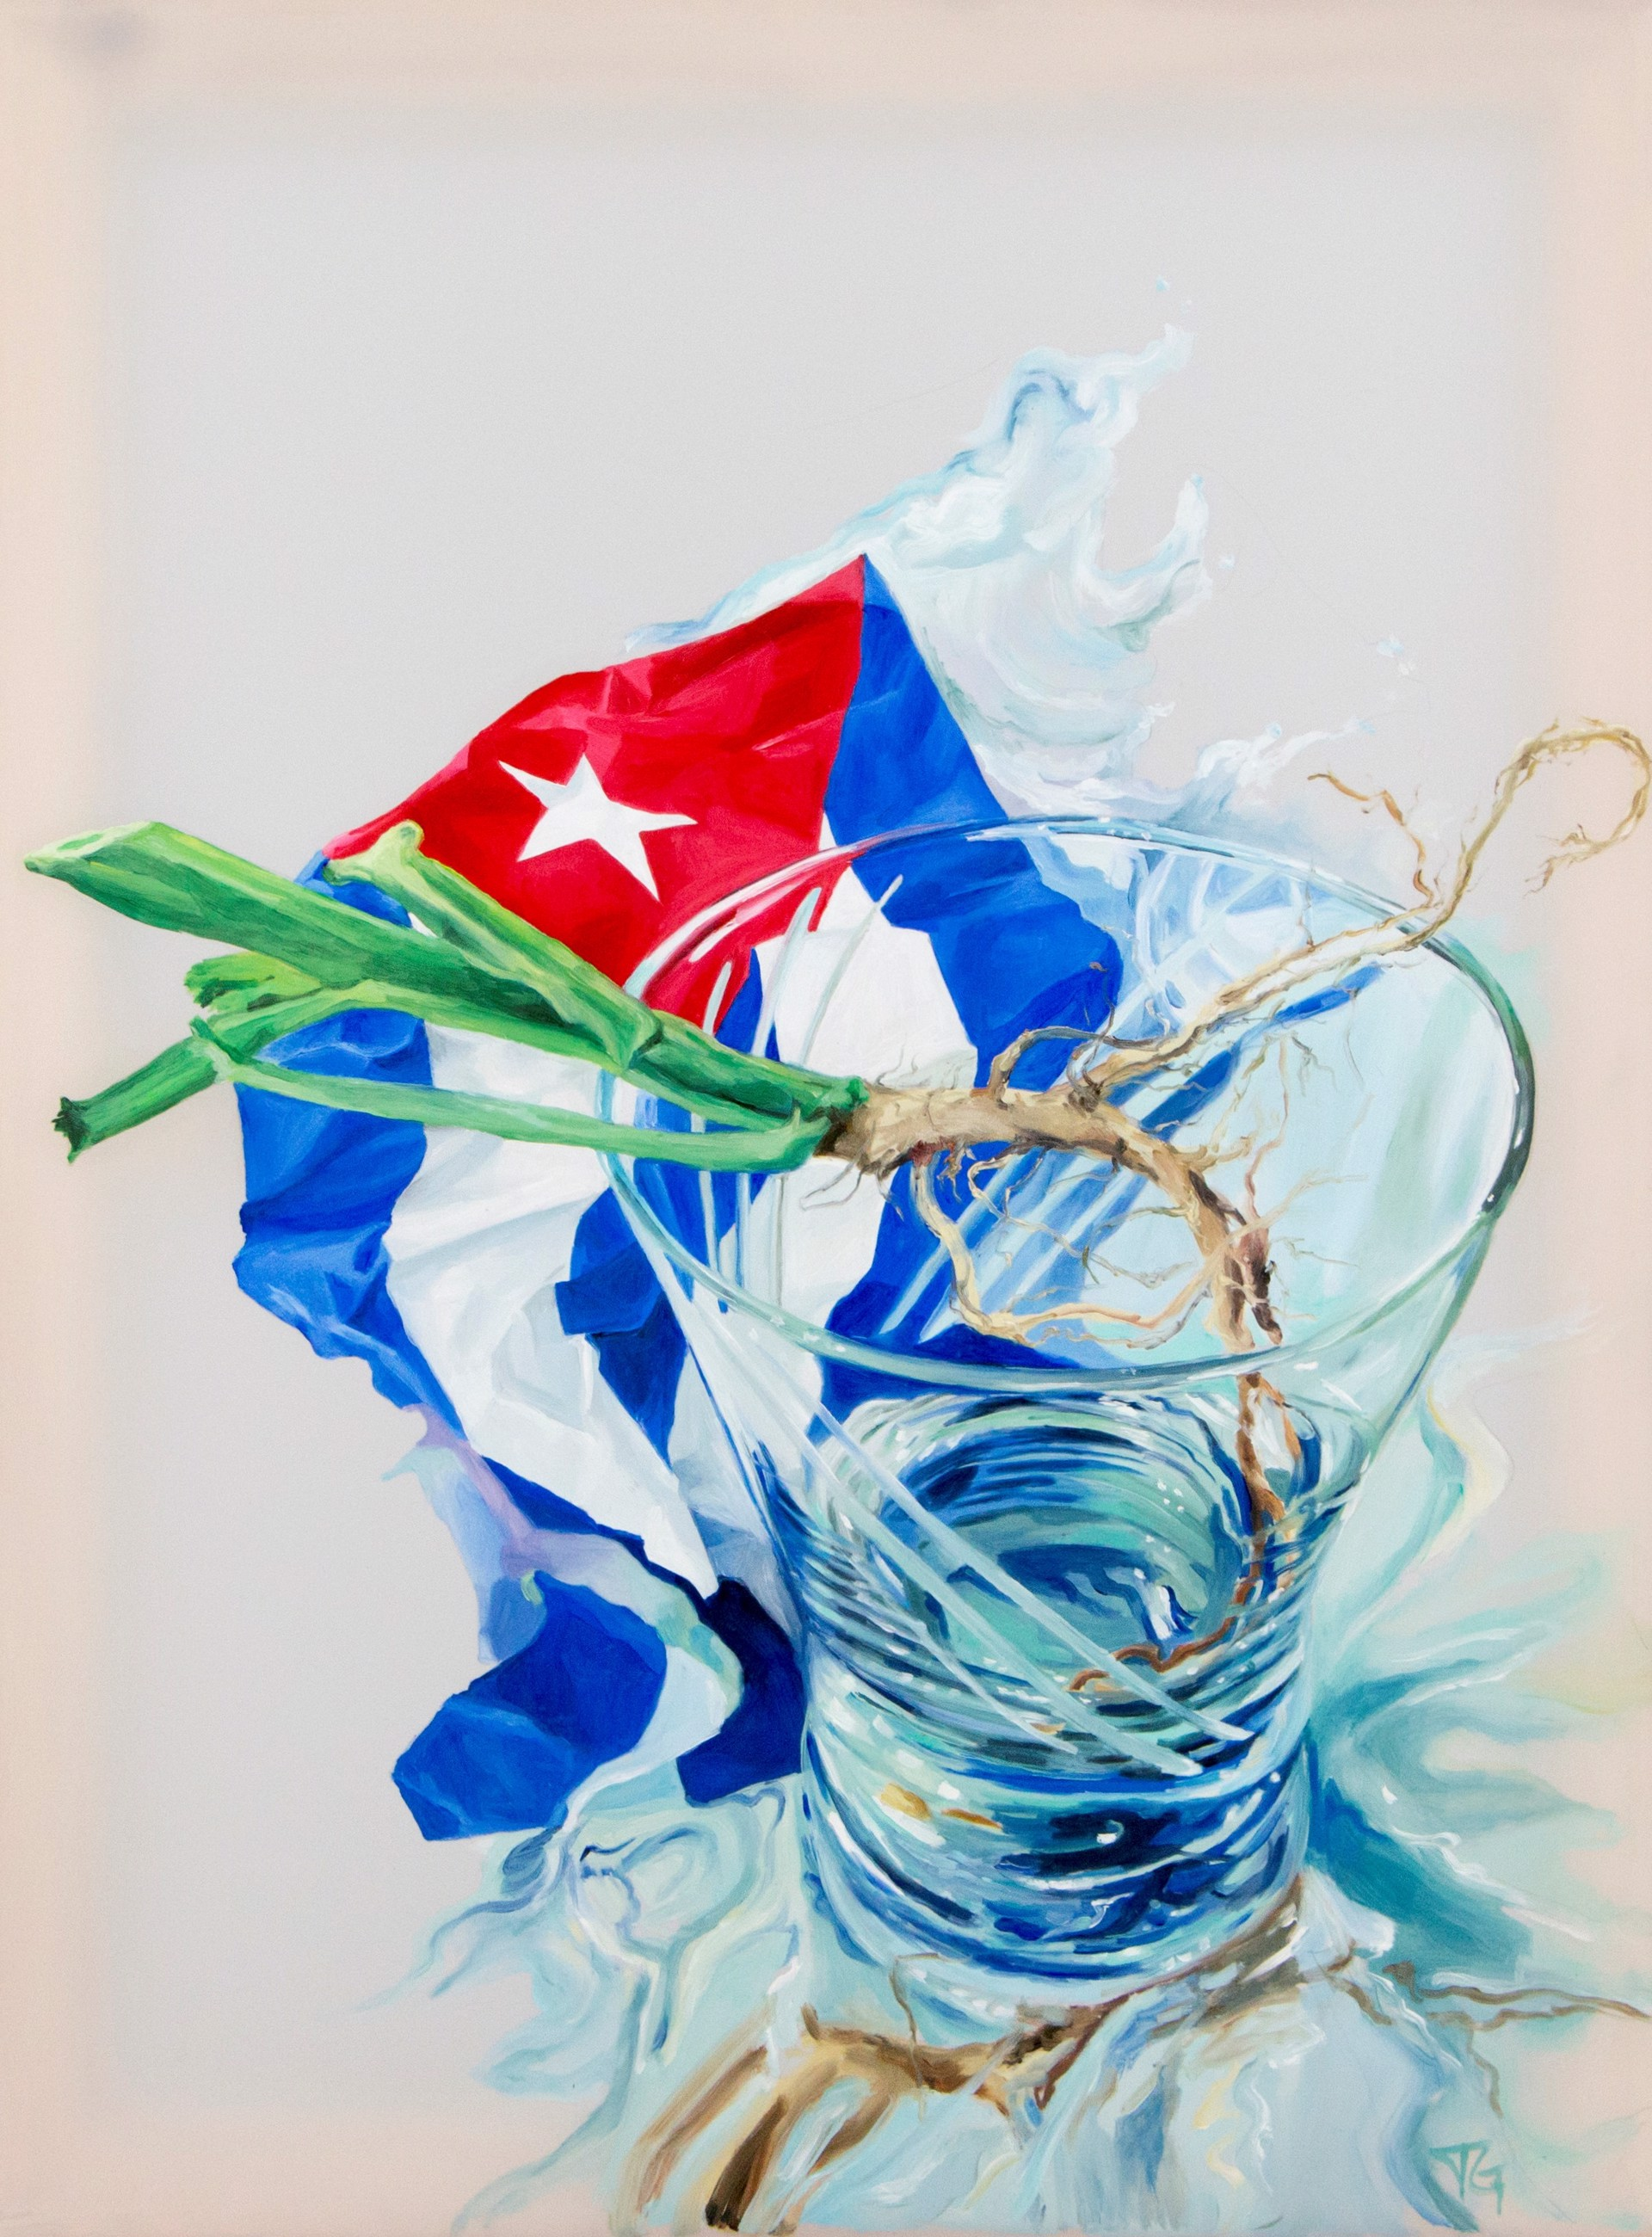 Cuba Libre (Little Lie)  by Tatiana Garmendia